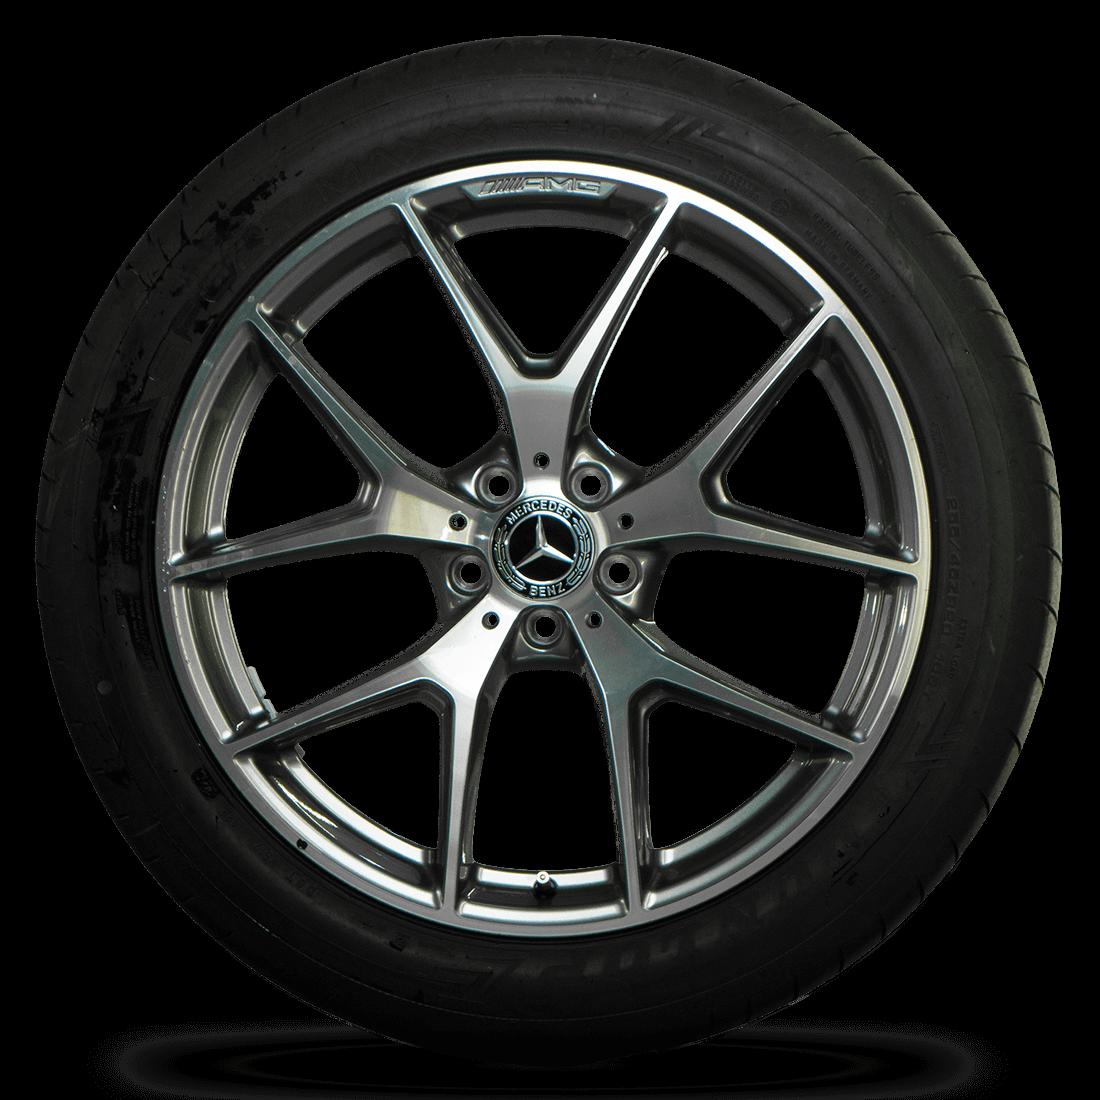 AMG 20 inch rims Mercedes GLC X253 C253 facelift aluminum rims summer wheels NEW